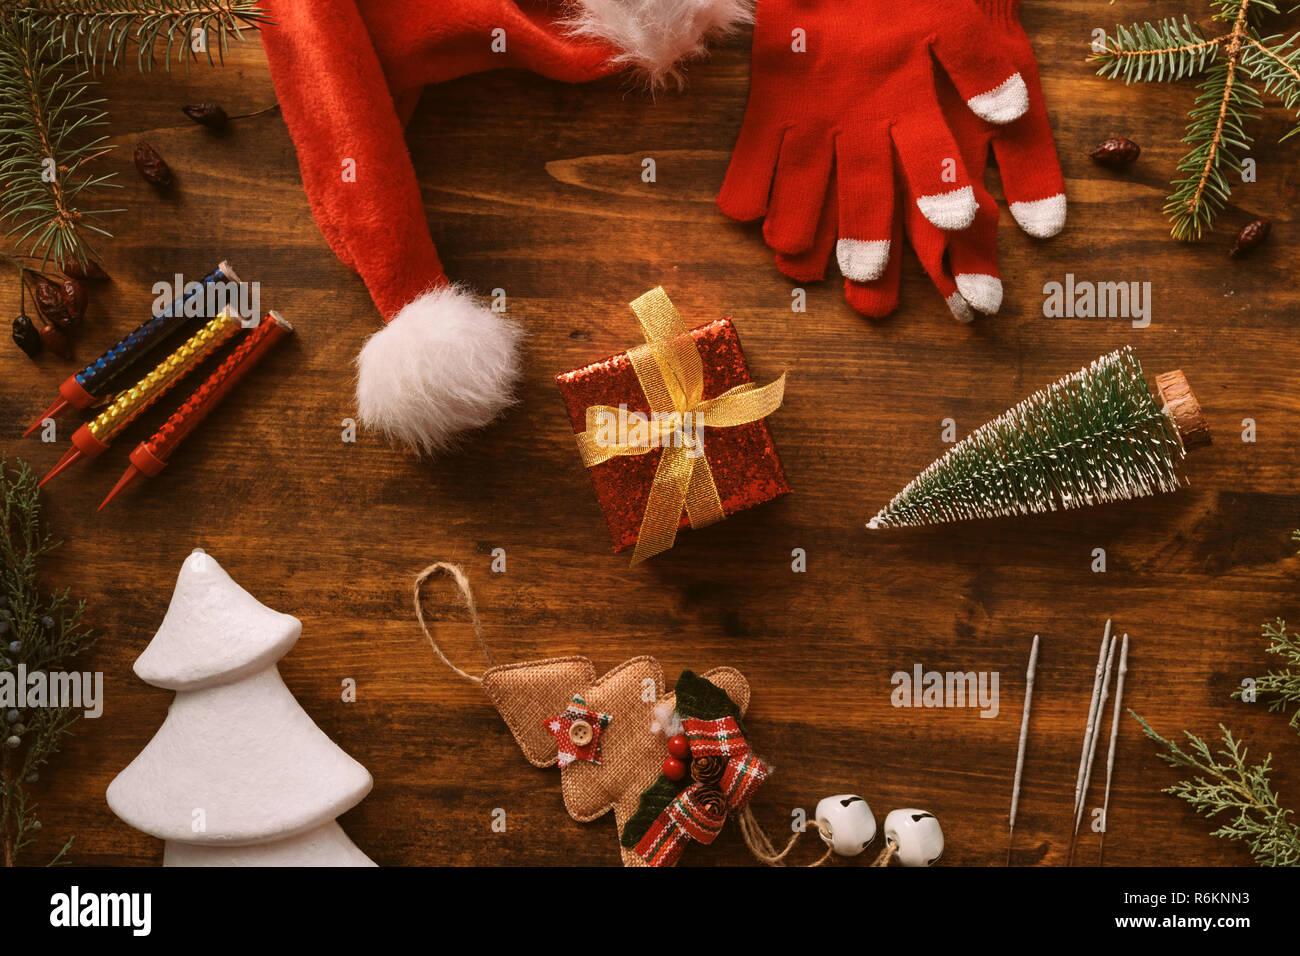 Weihnachten Nostalgisch.Nostalgisch Weihnachten Stockfotos Nostalgisch Weihnachten Bilder